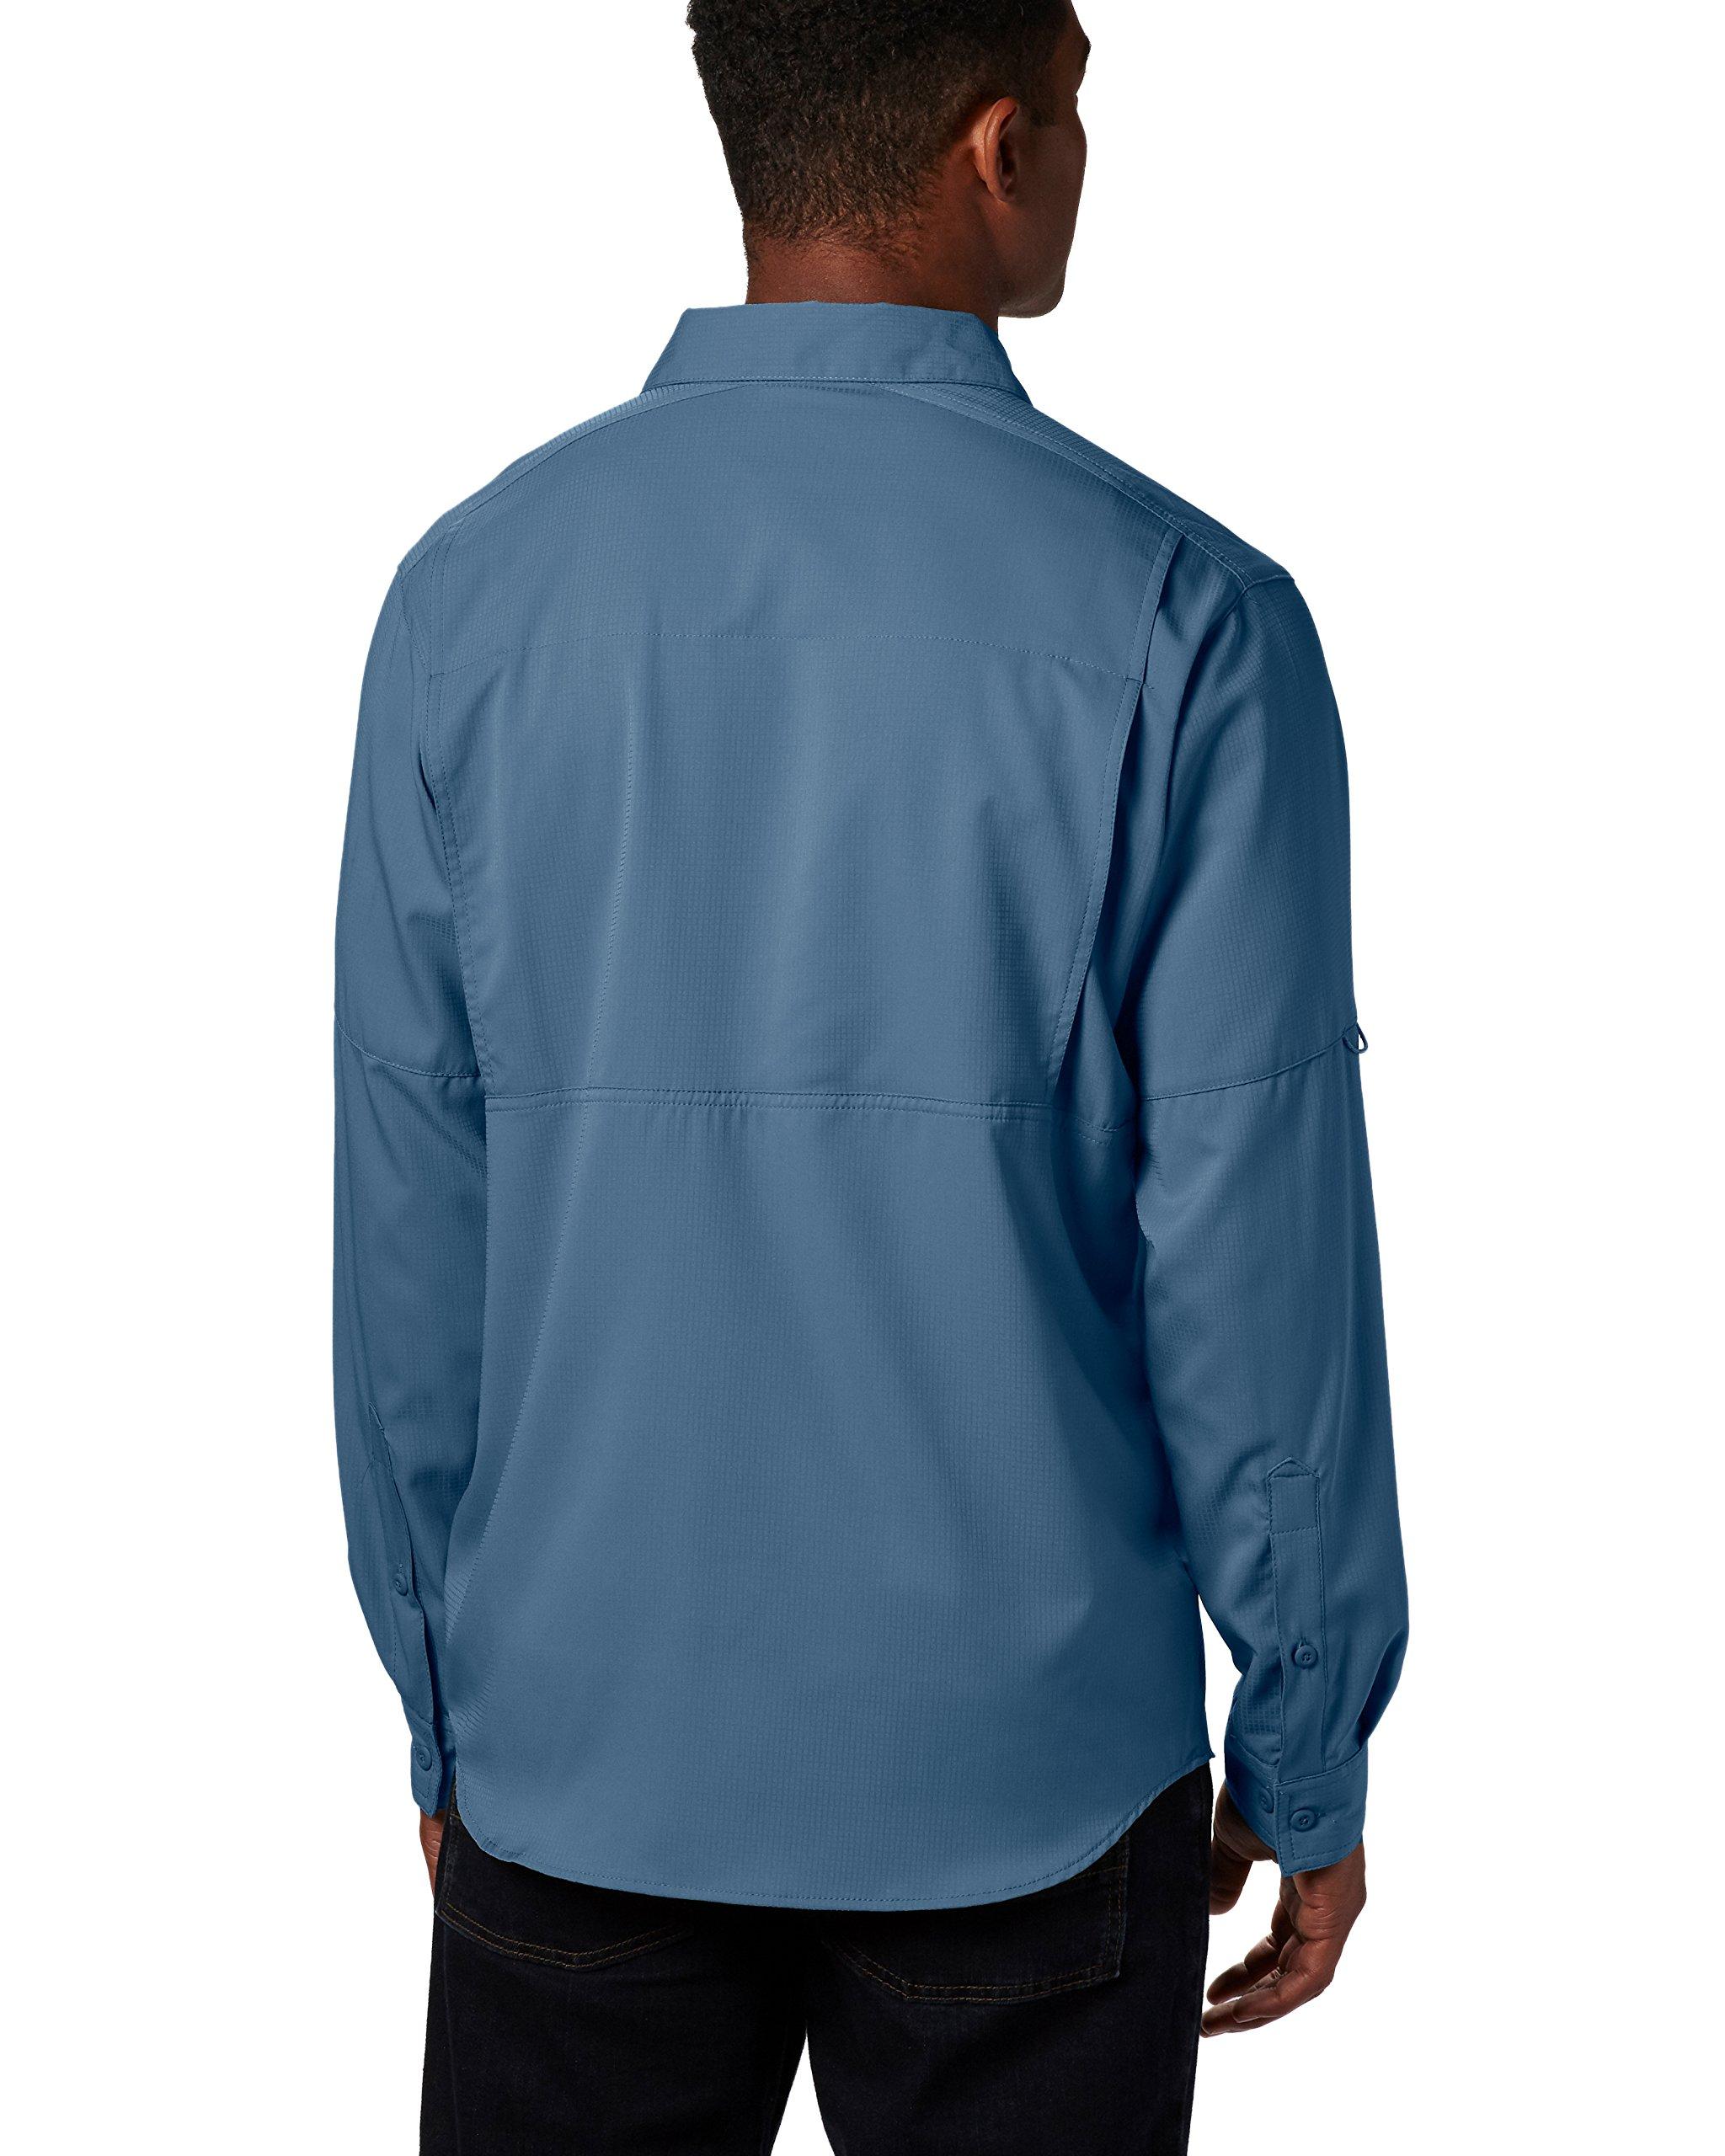 87d99fe3c28 Columbia Men's Silver Ridge Lite Long Sleeve Shirt - Choose SZ/color ...